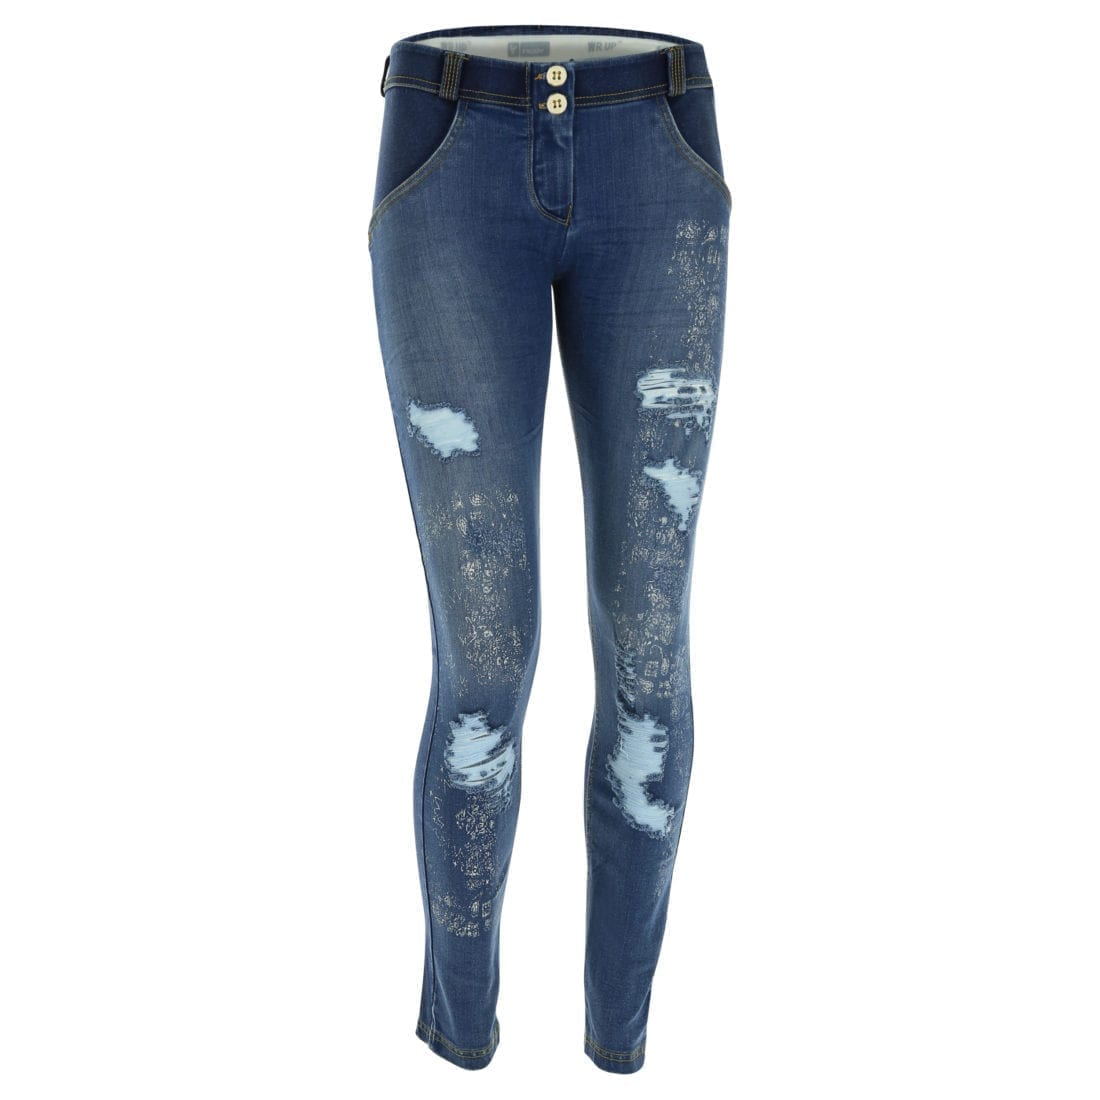 FREDDY WR.UP Reg Rise Skinny-fit trousers distressed denim w/Paisley Print -WRUP1RF803